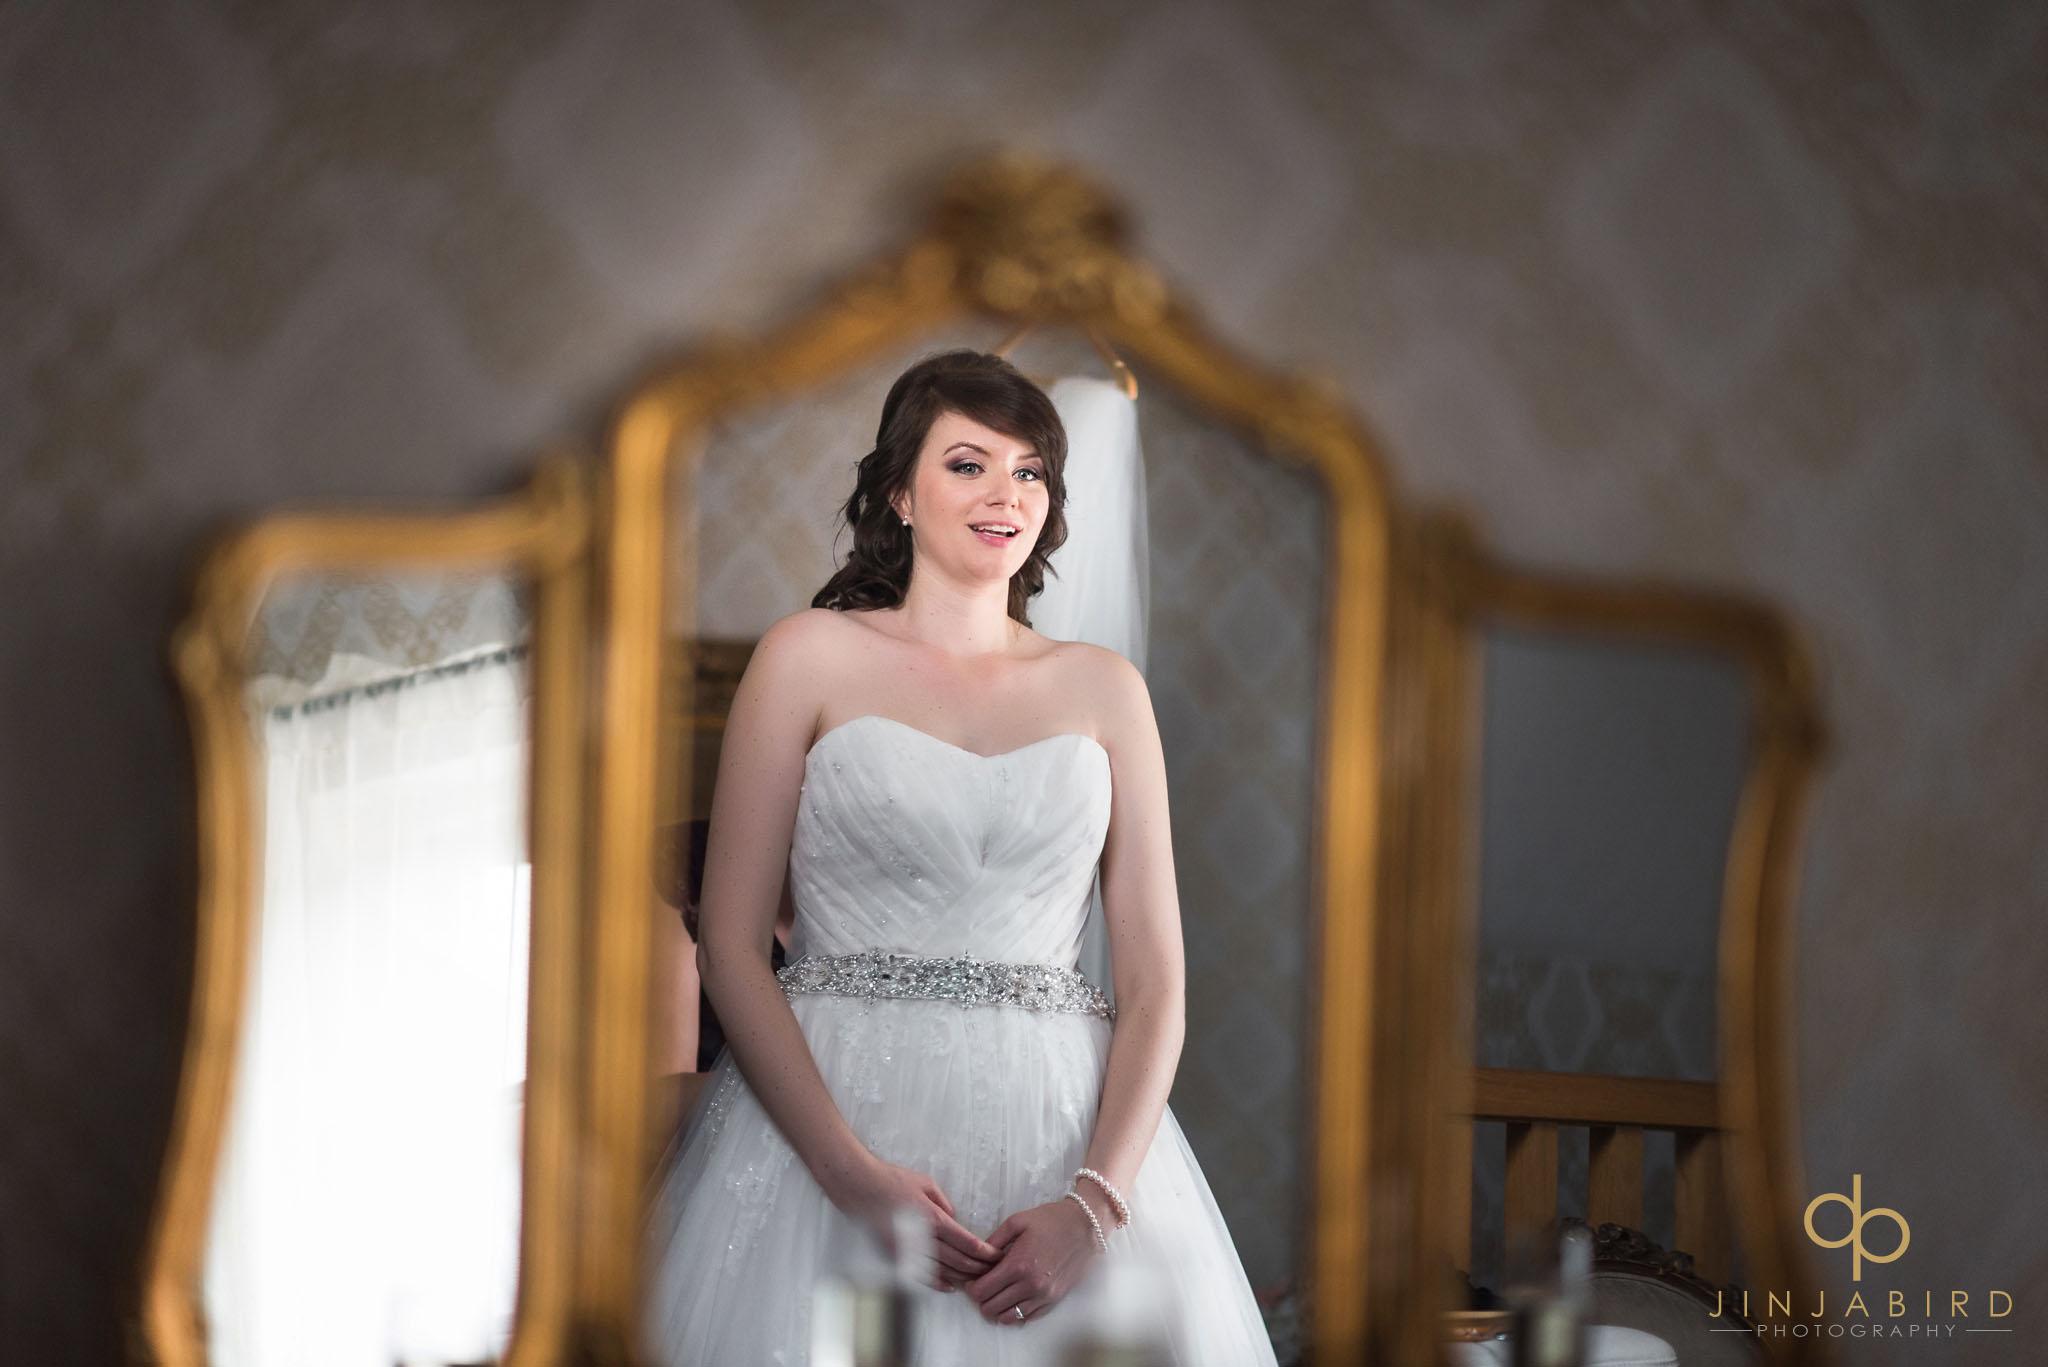 bride looking in mirror getting ready bassmead manor